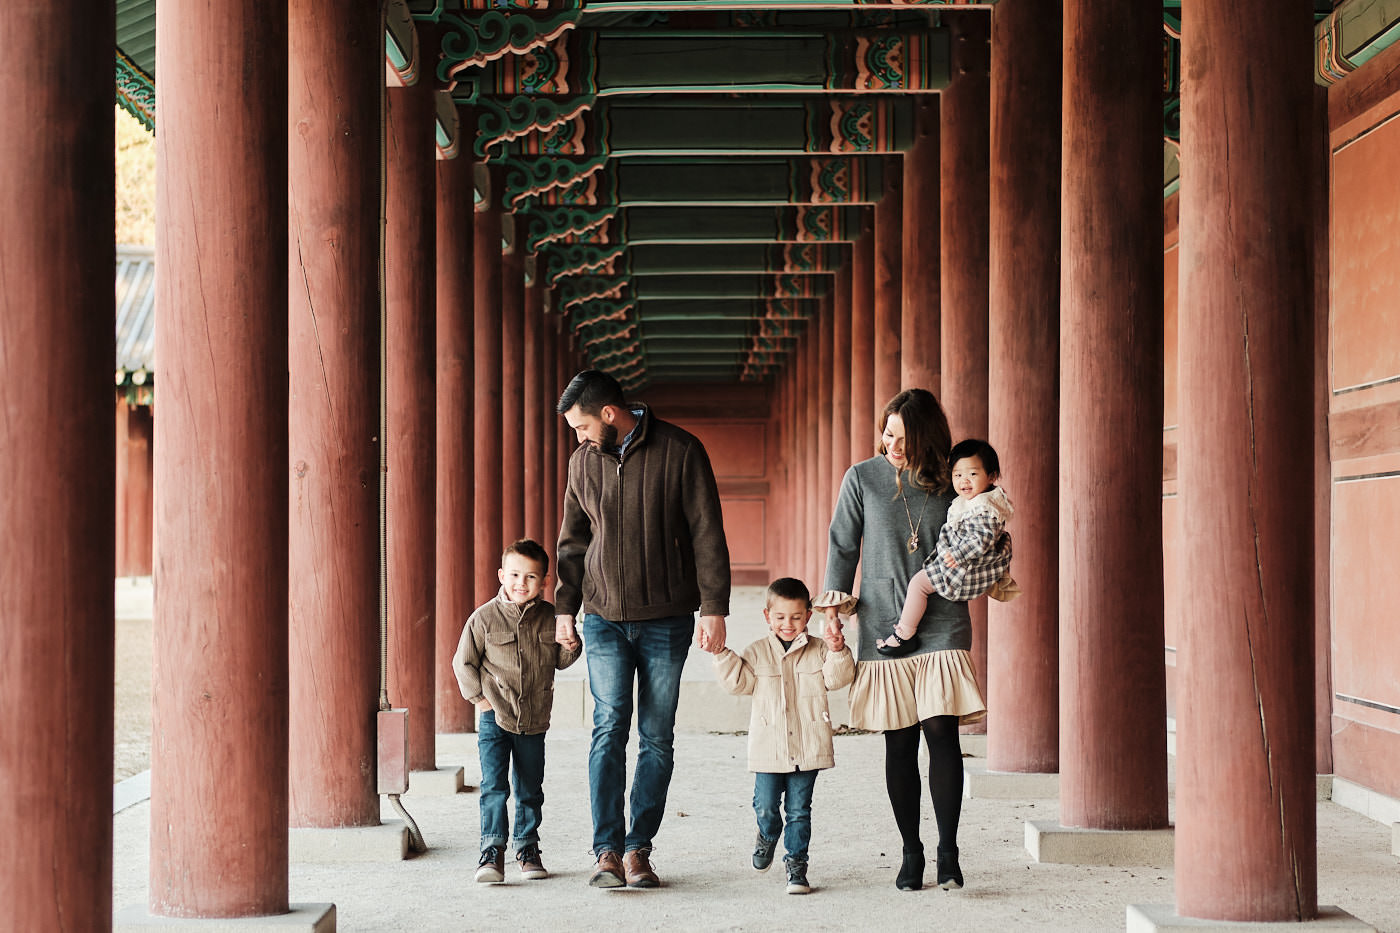 Venneman Family Photoshoot - Walking in Changdeokgung